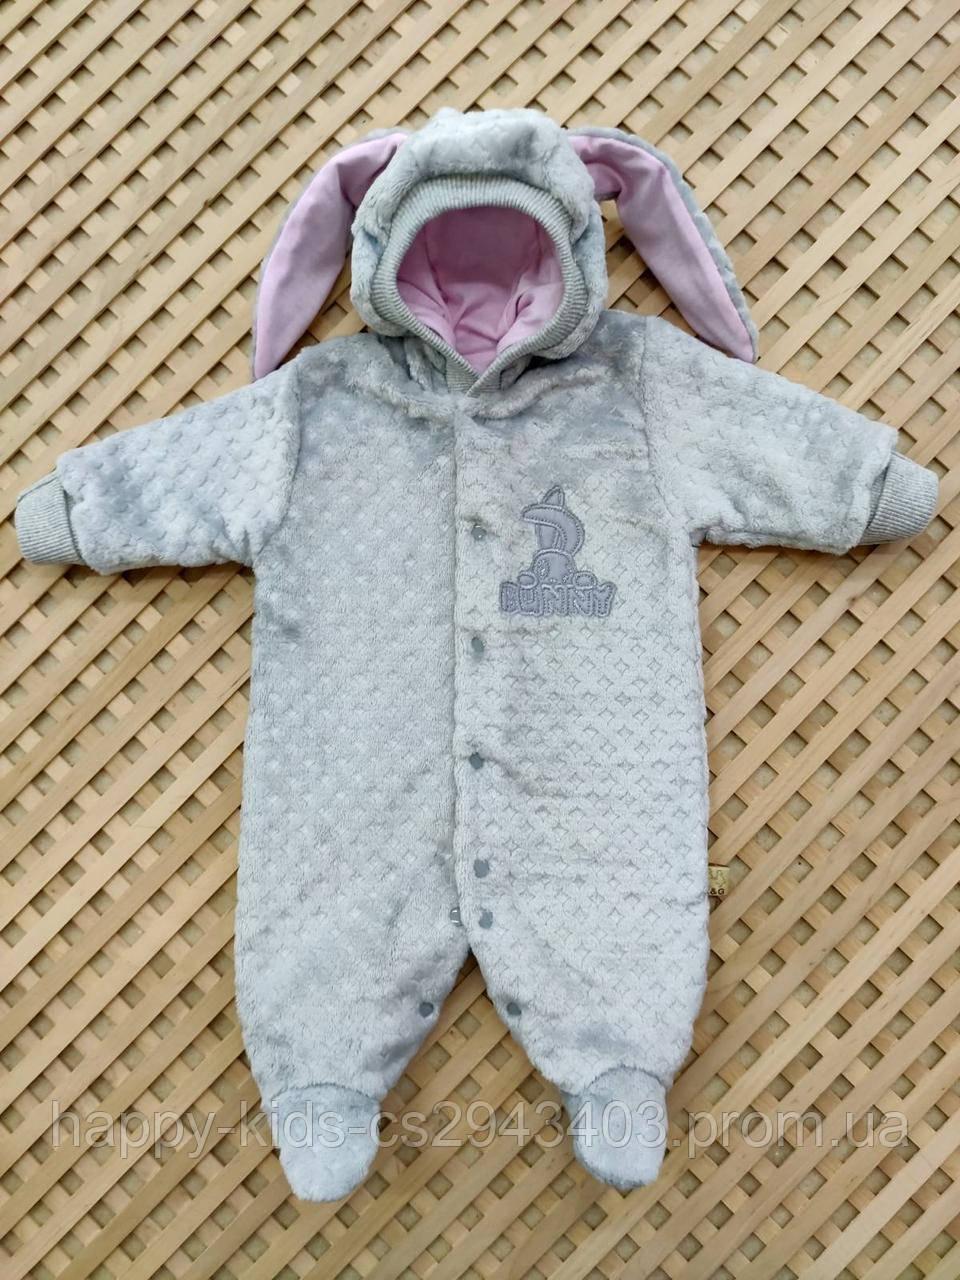 Утеплённый комбинезон для малышей